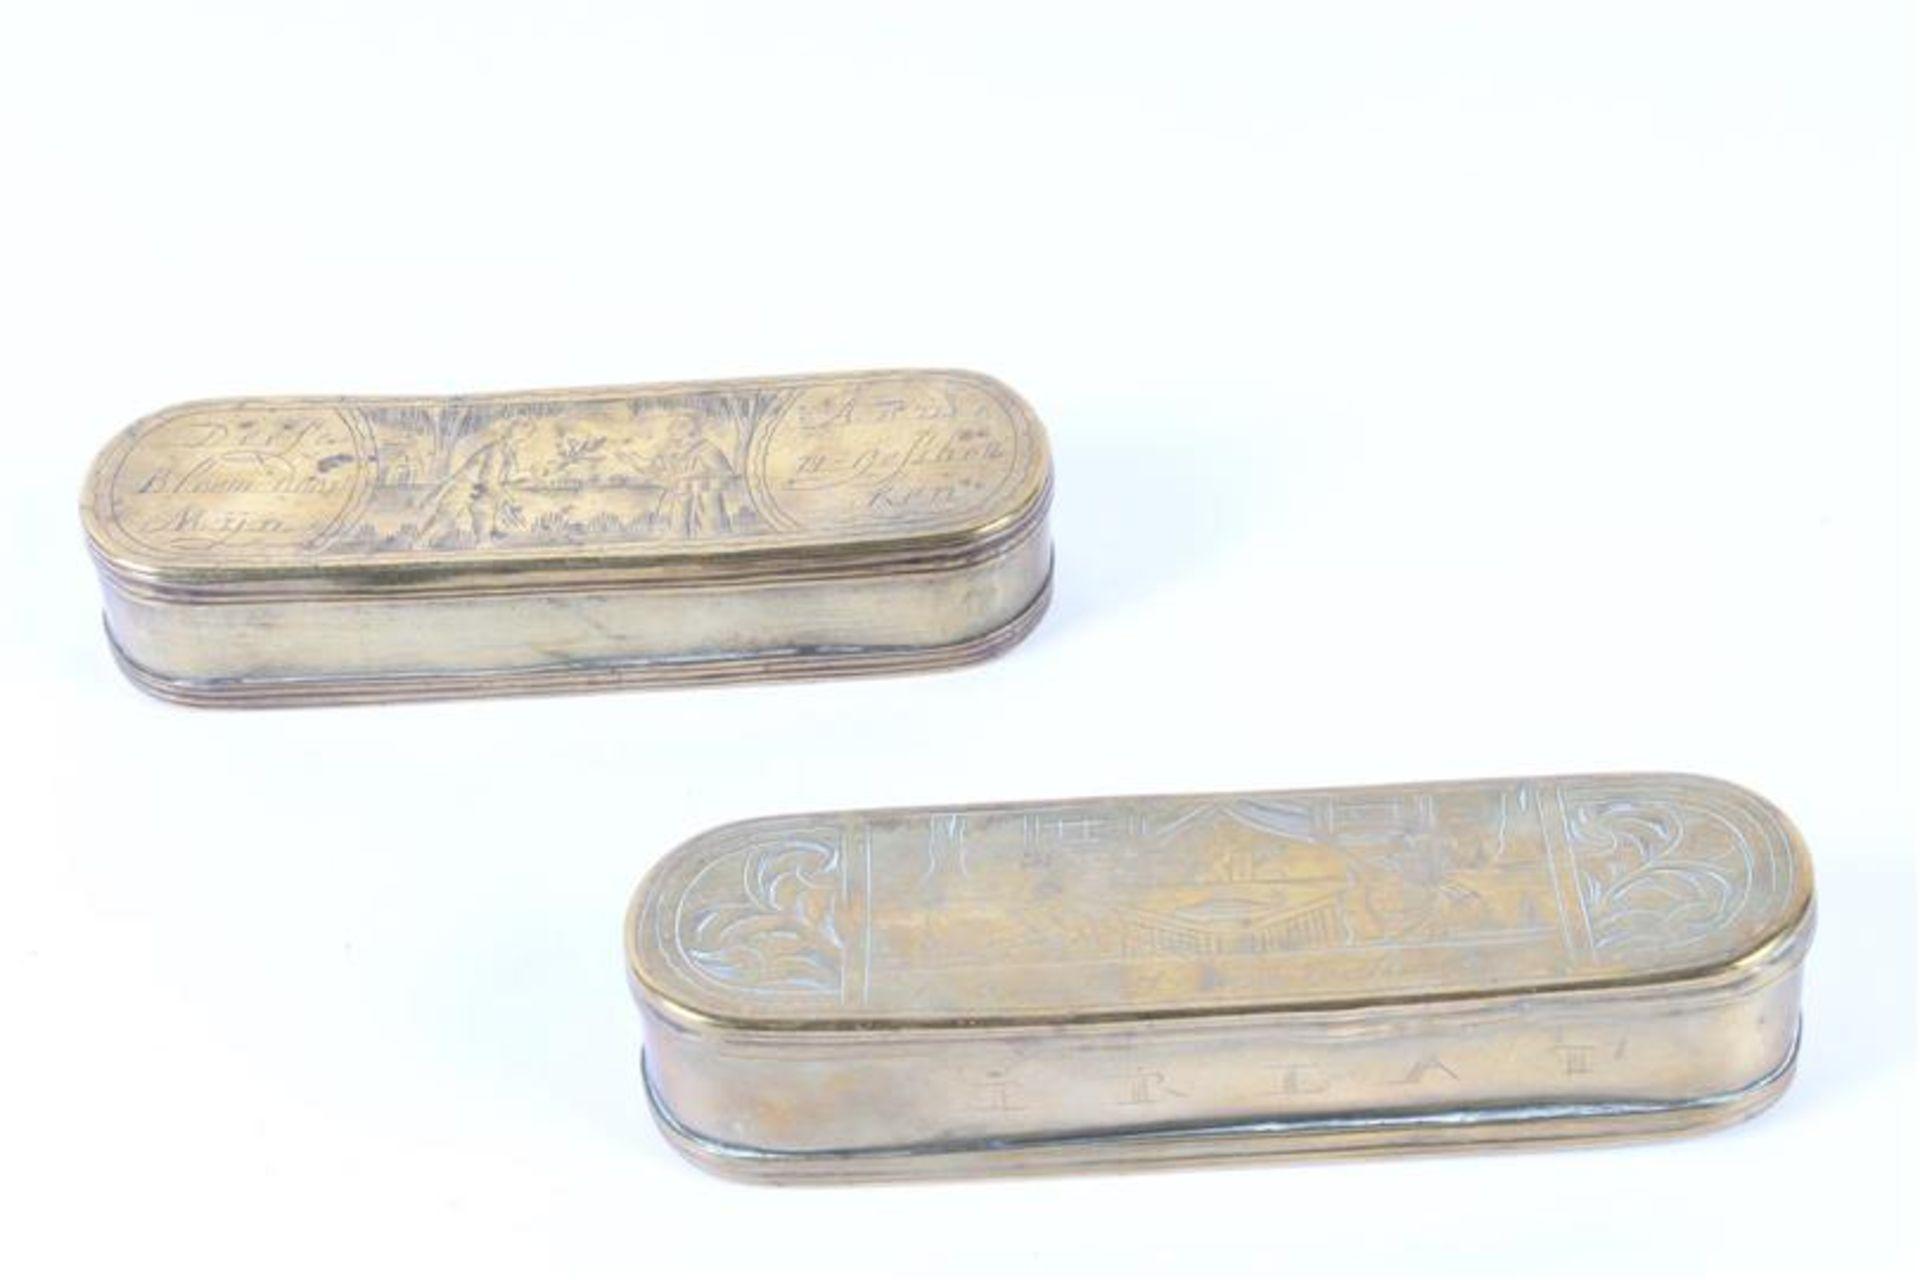 Los 31 - Twee koperen tabaksdozen, L: 16 en 15 cm.